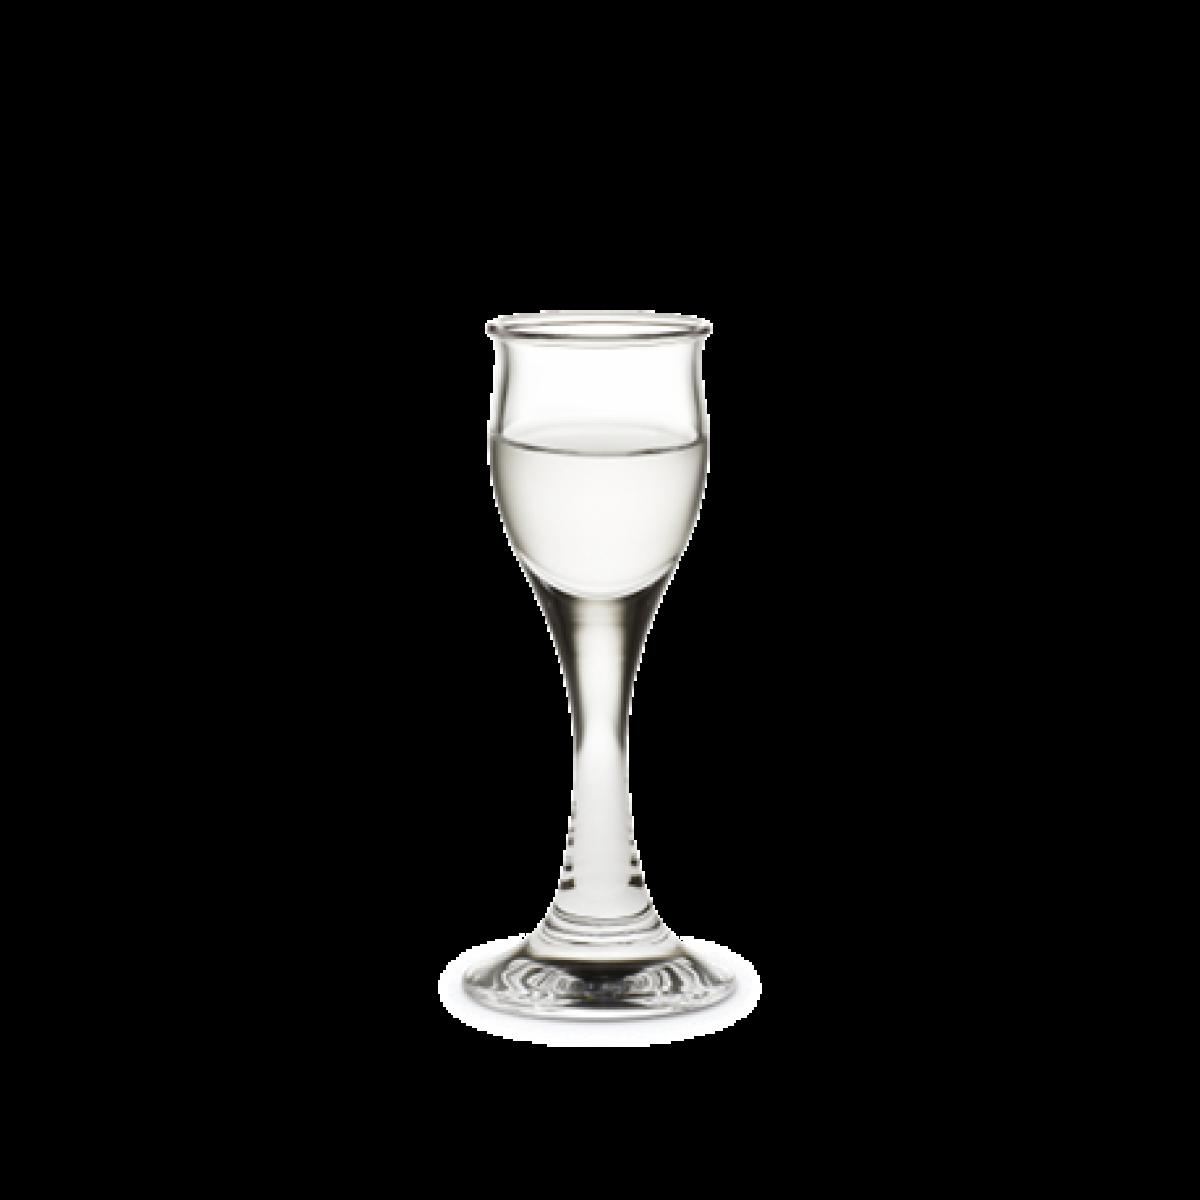 HOLMEGAARD snapsglas 3 cl.